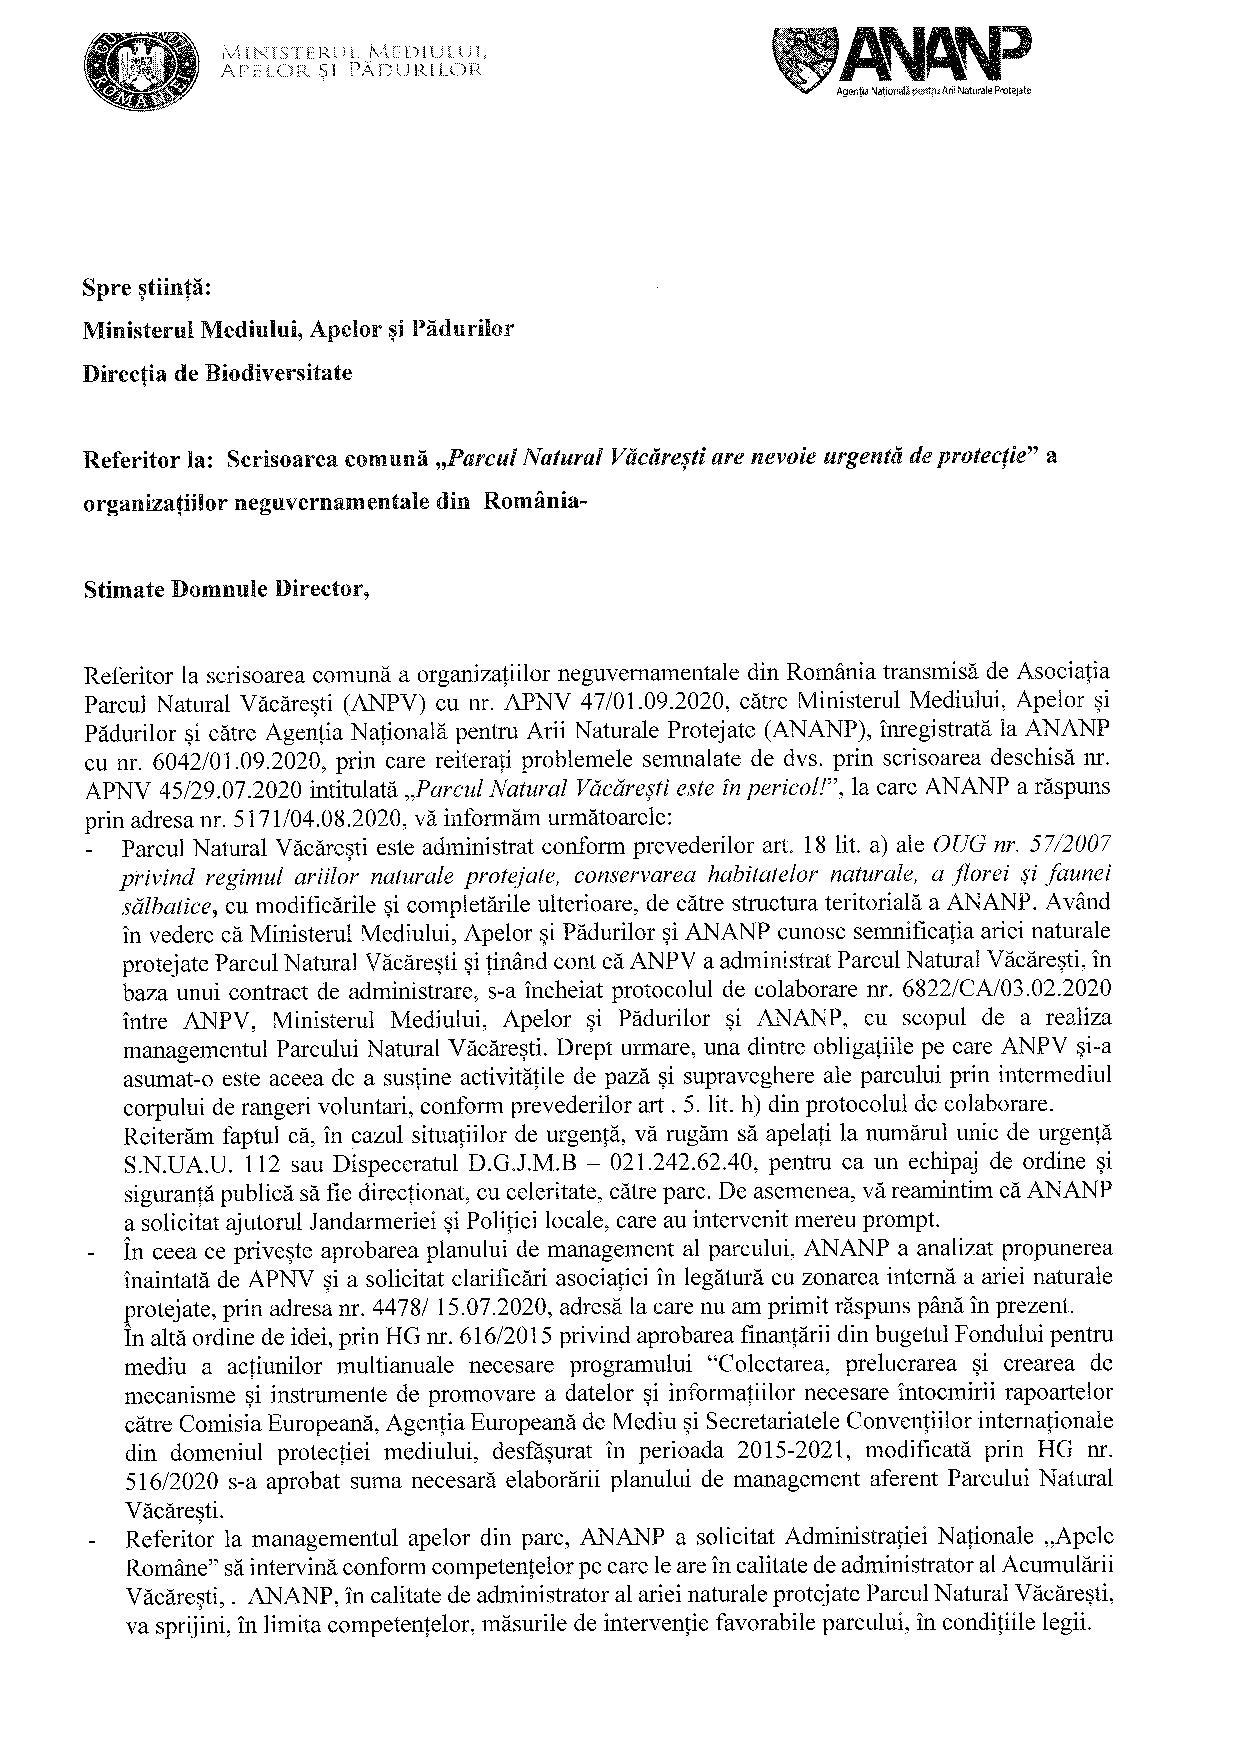 raspuns-ananp-scrisoare-deschisa-32-onguri-2.jpg